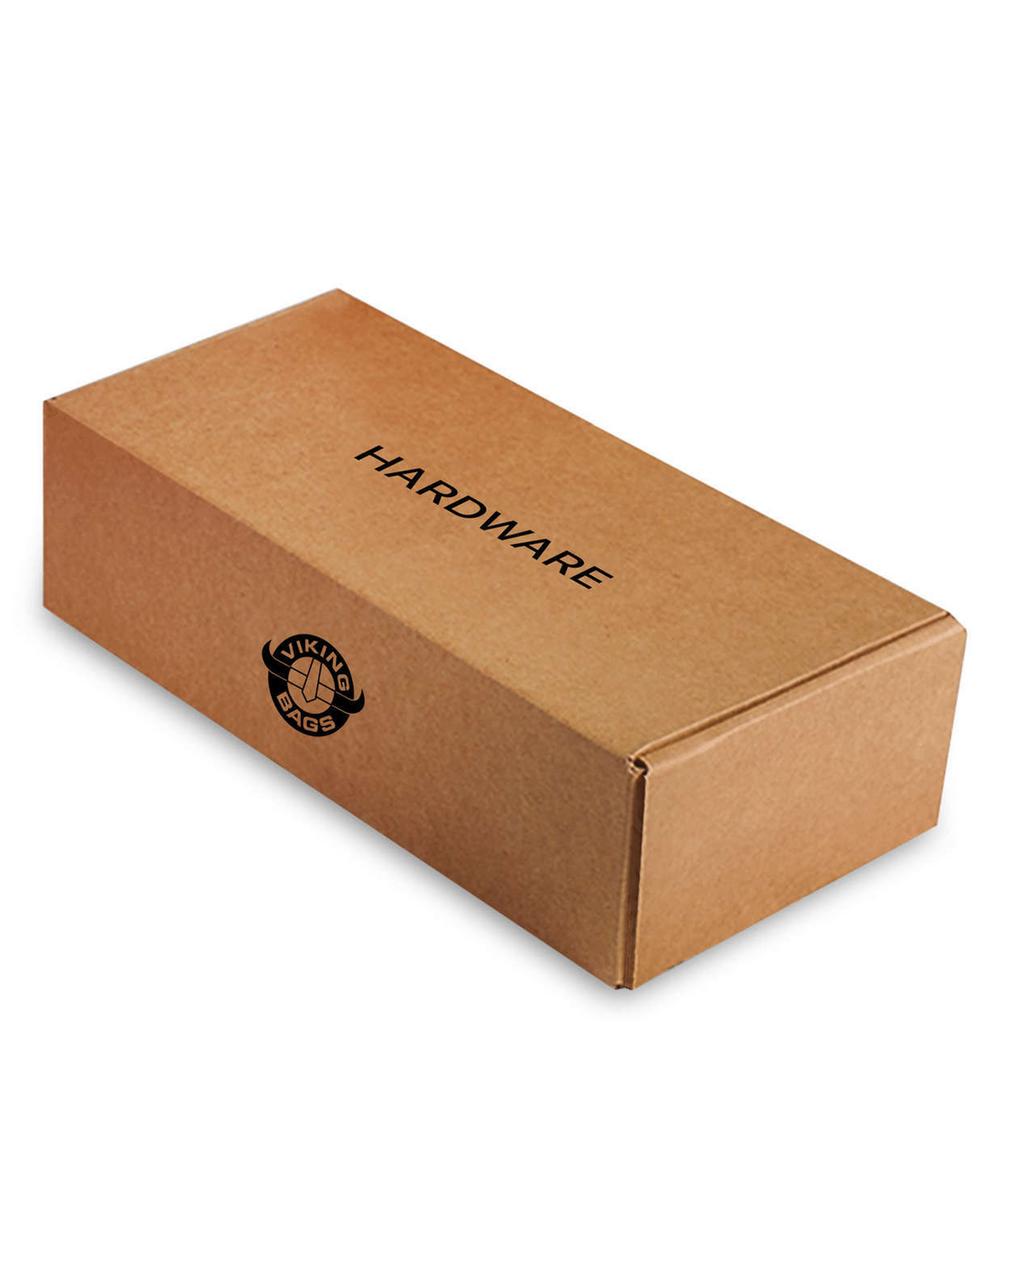 Honda VTX 1300 R Retro Viking Lamellar Large Leather Covered Hard Saddlebags Hardware Box